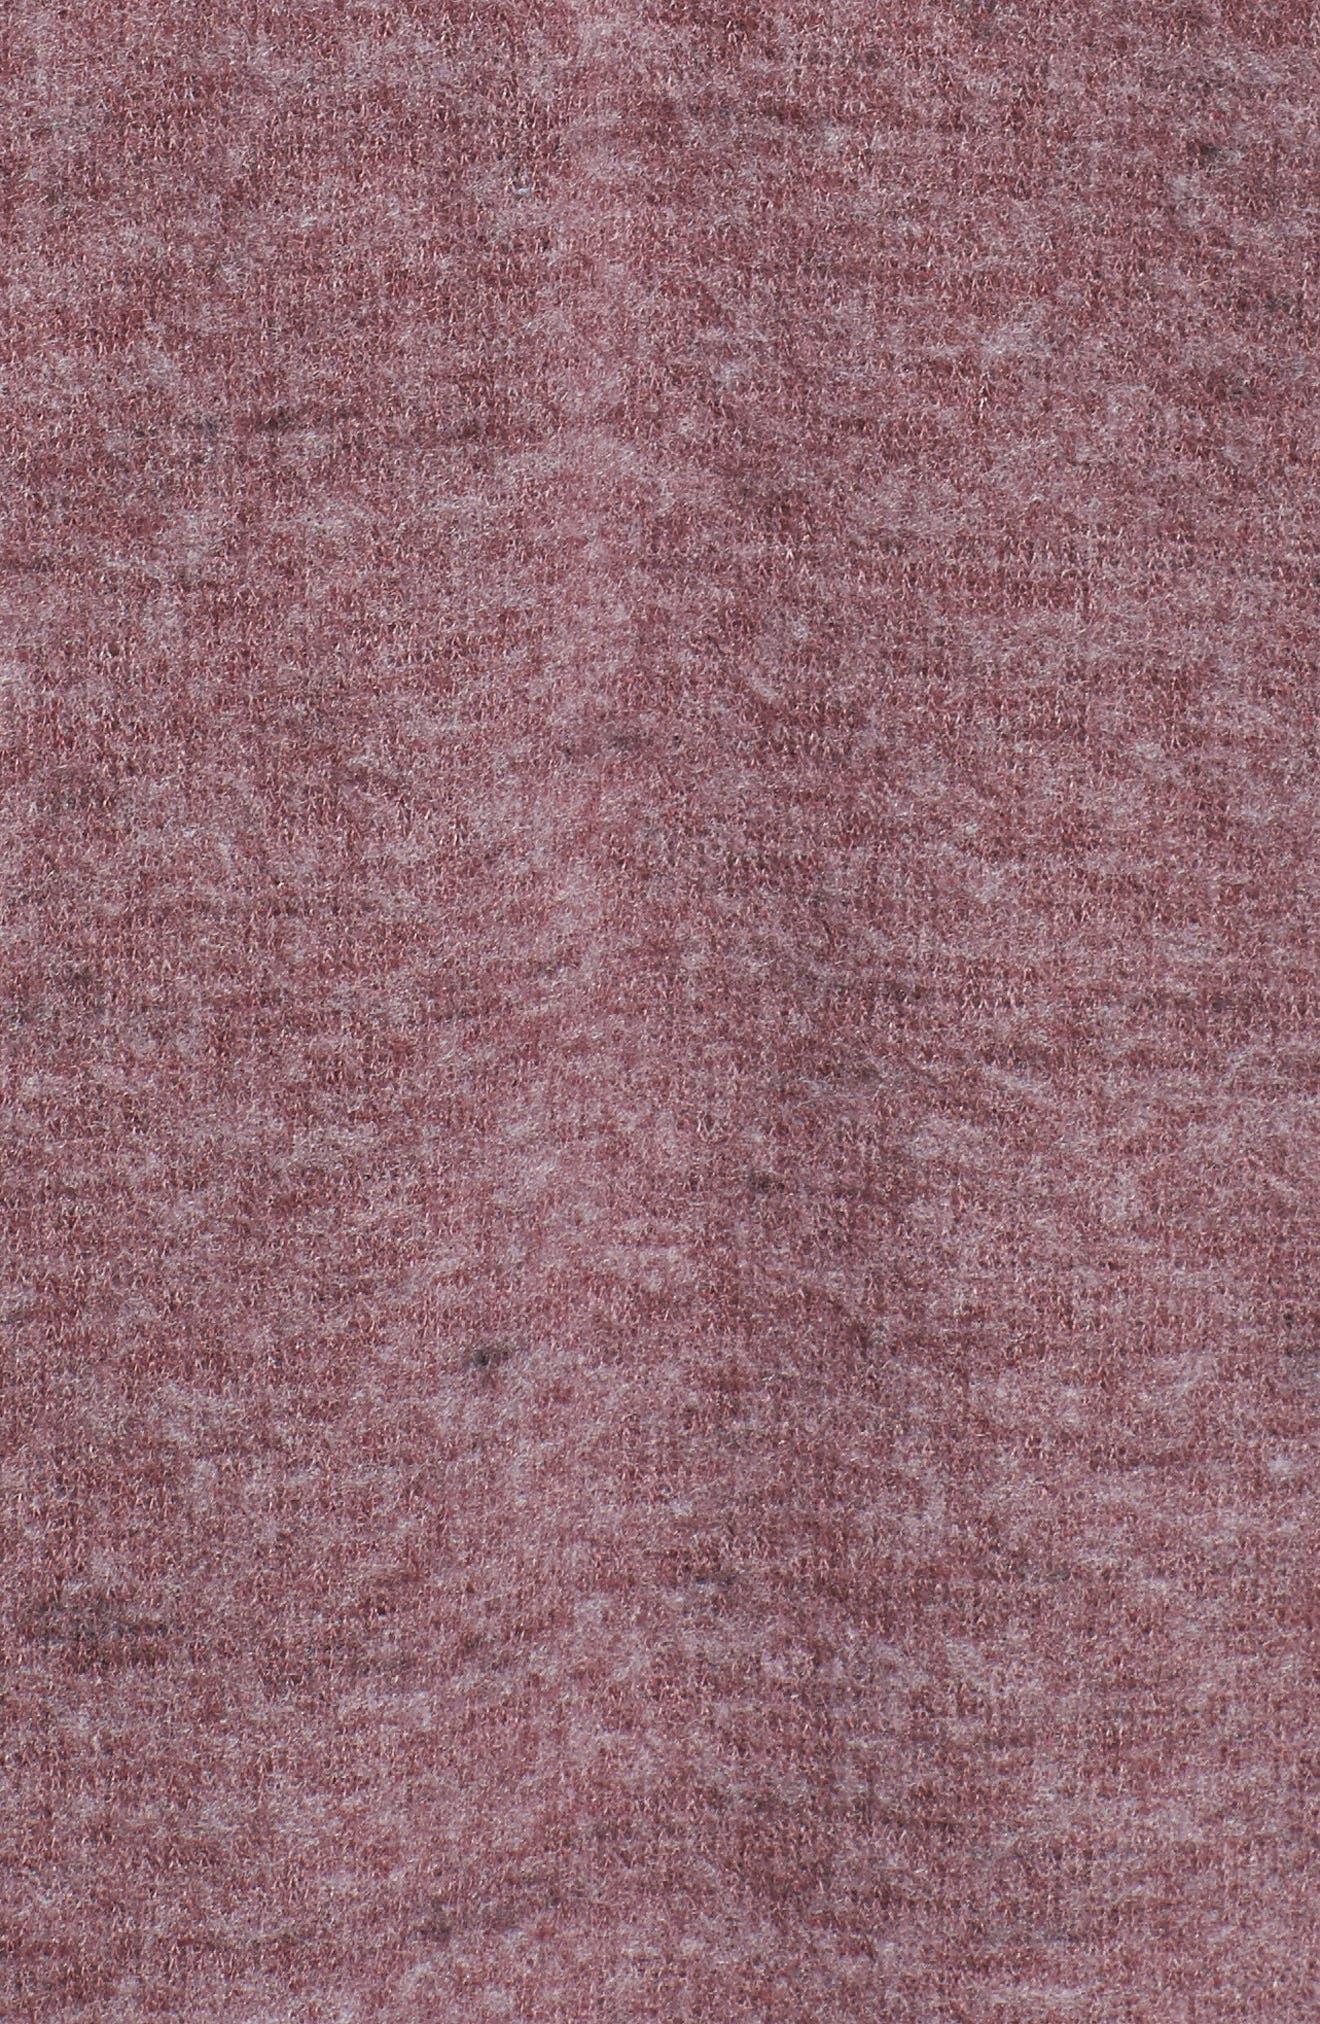 Caslon Open Knit Cardigan,                             Alternate thumbnail 25, color,